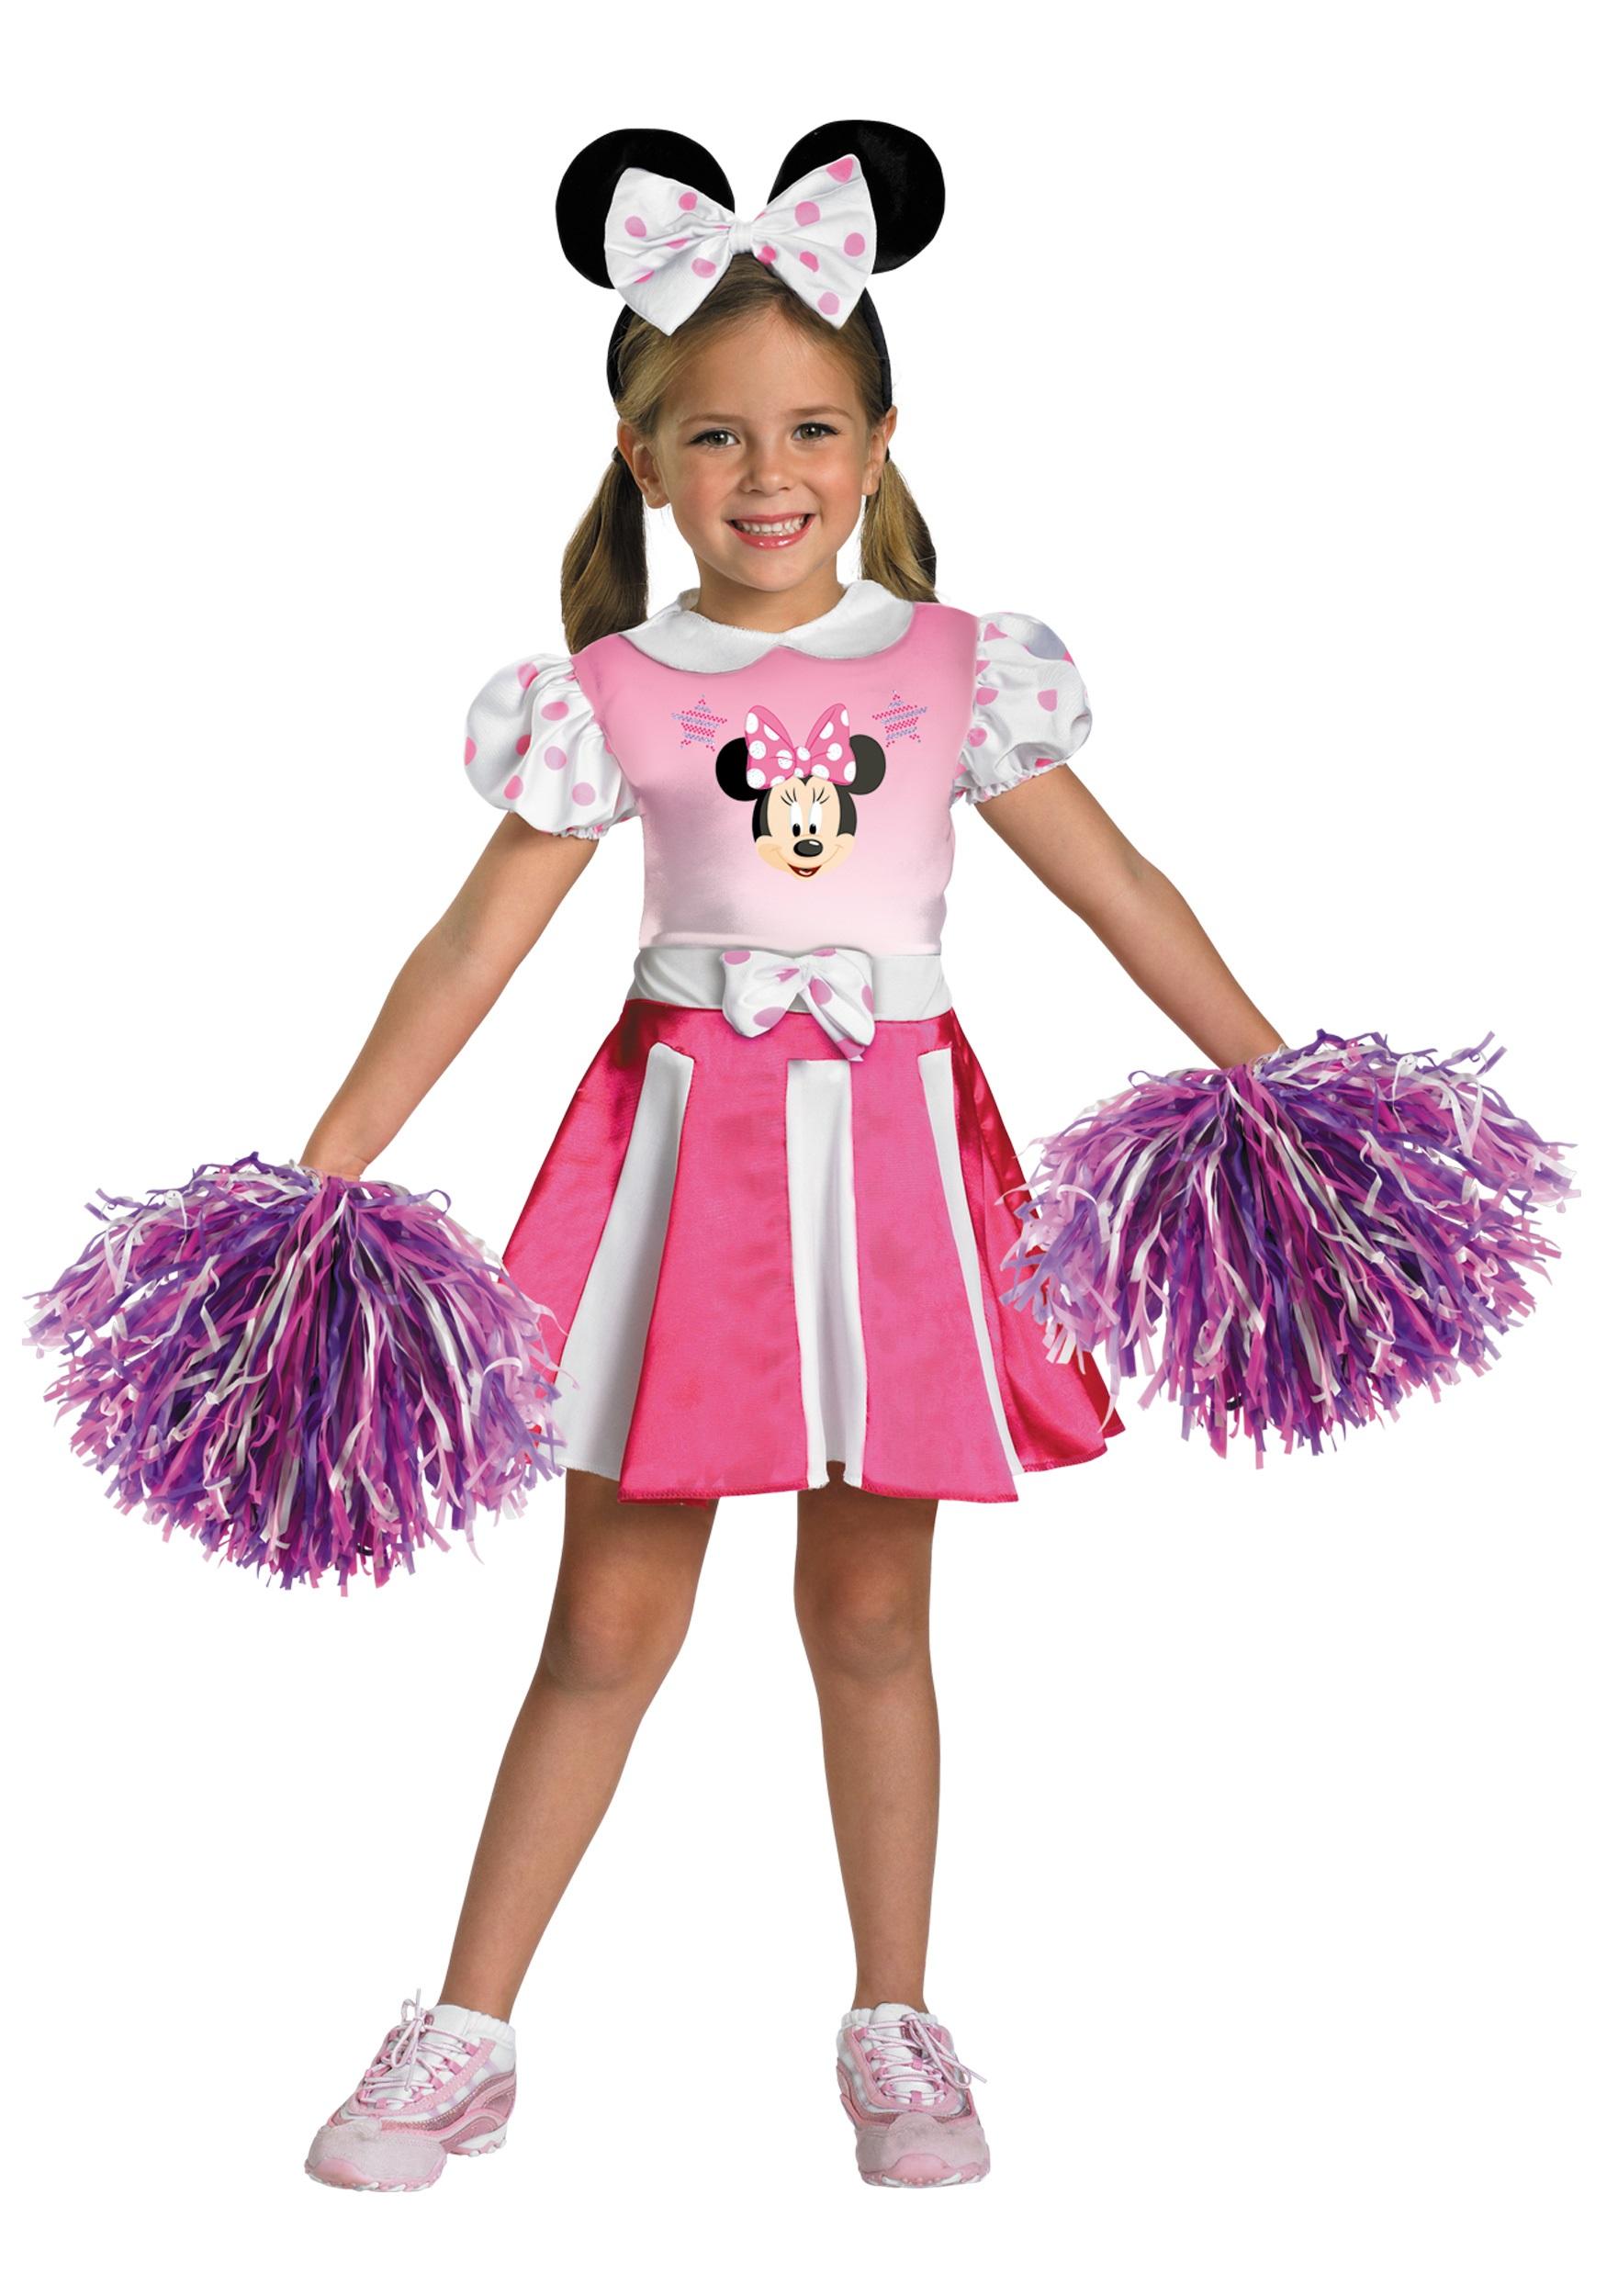 Girls Minnie Mouse Cheerleader Costume  sc 1 st  Halloween Costumes & Girls Minnie Mouse Cheerleader Costume - Halloween Costumes